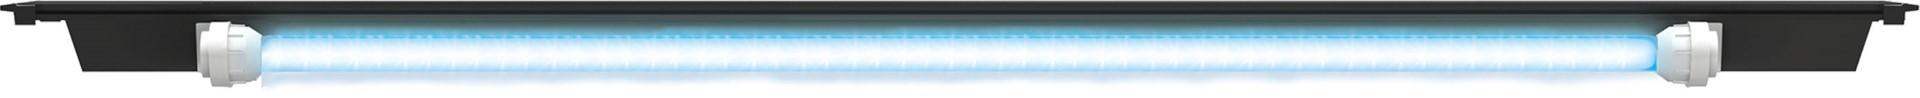 Juwel balk LED 150 cm 2x31 Watt inclusief lamp